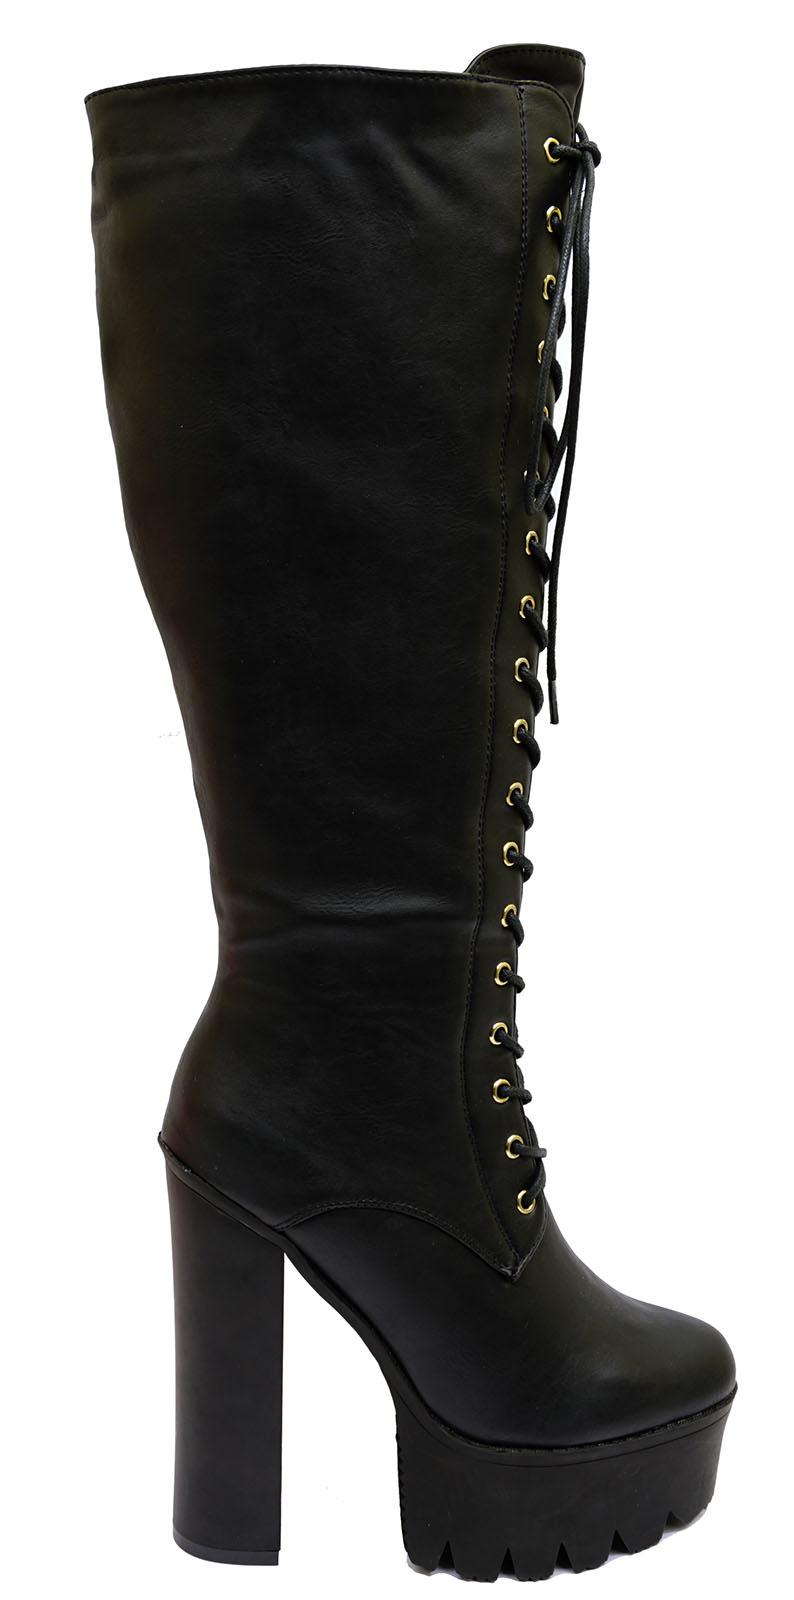 3d08fa7037a Sentinel WOMENS BLACK GO-GO RETRO KNEE HIGH PLATFORM FANCY DRESS BOOTS  SHOES SIZES 3-